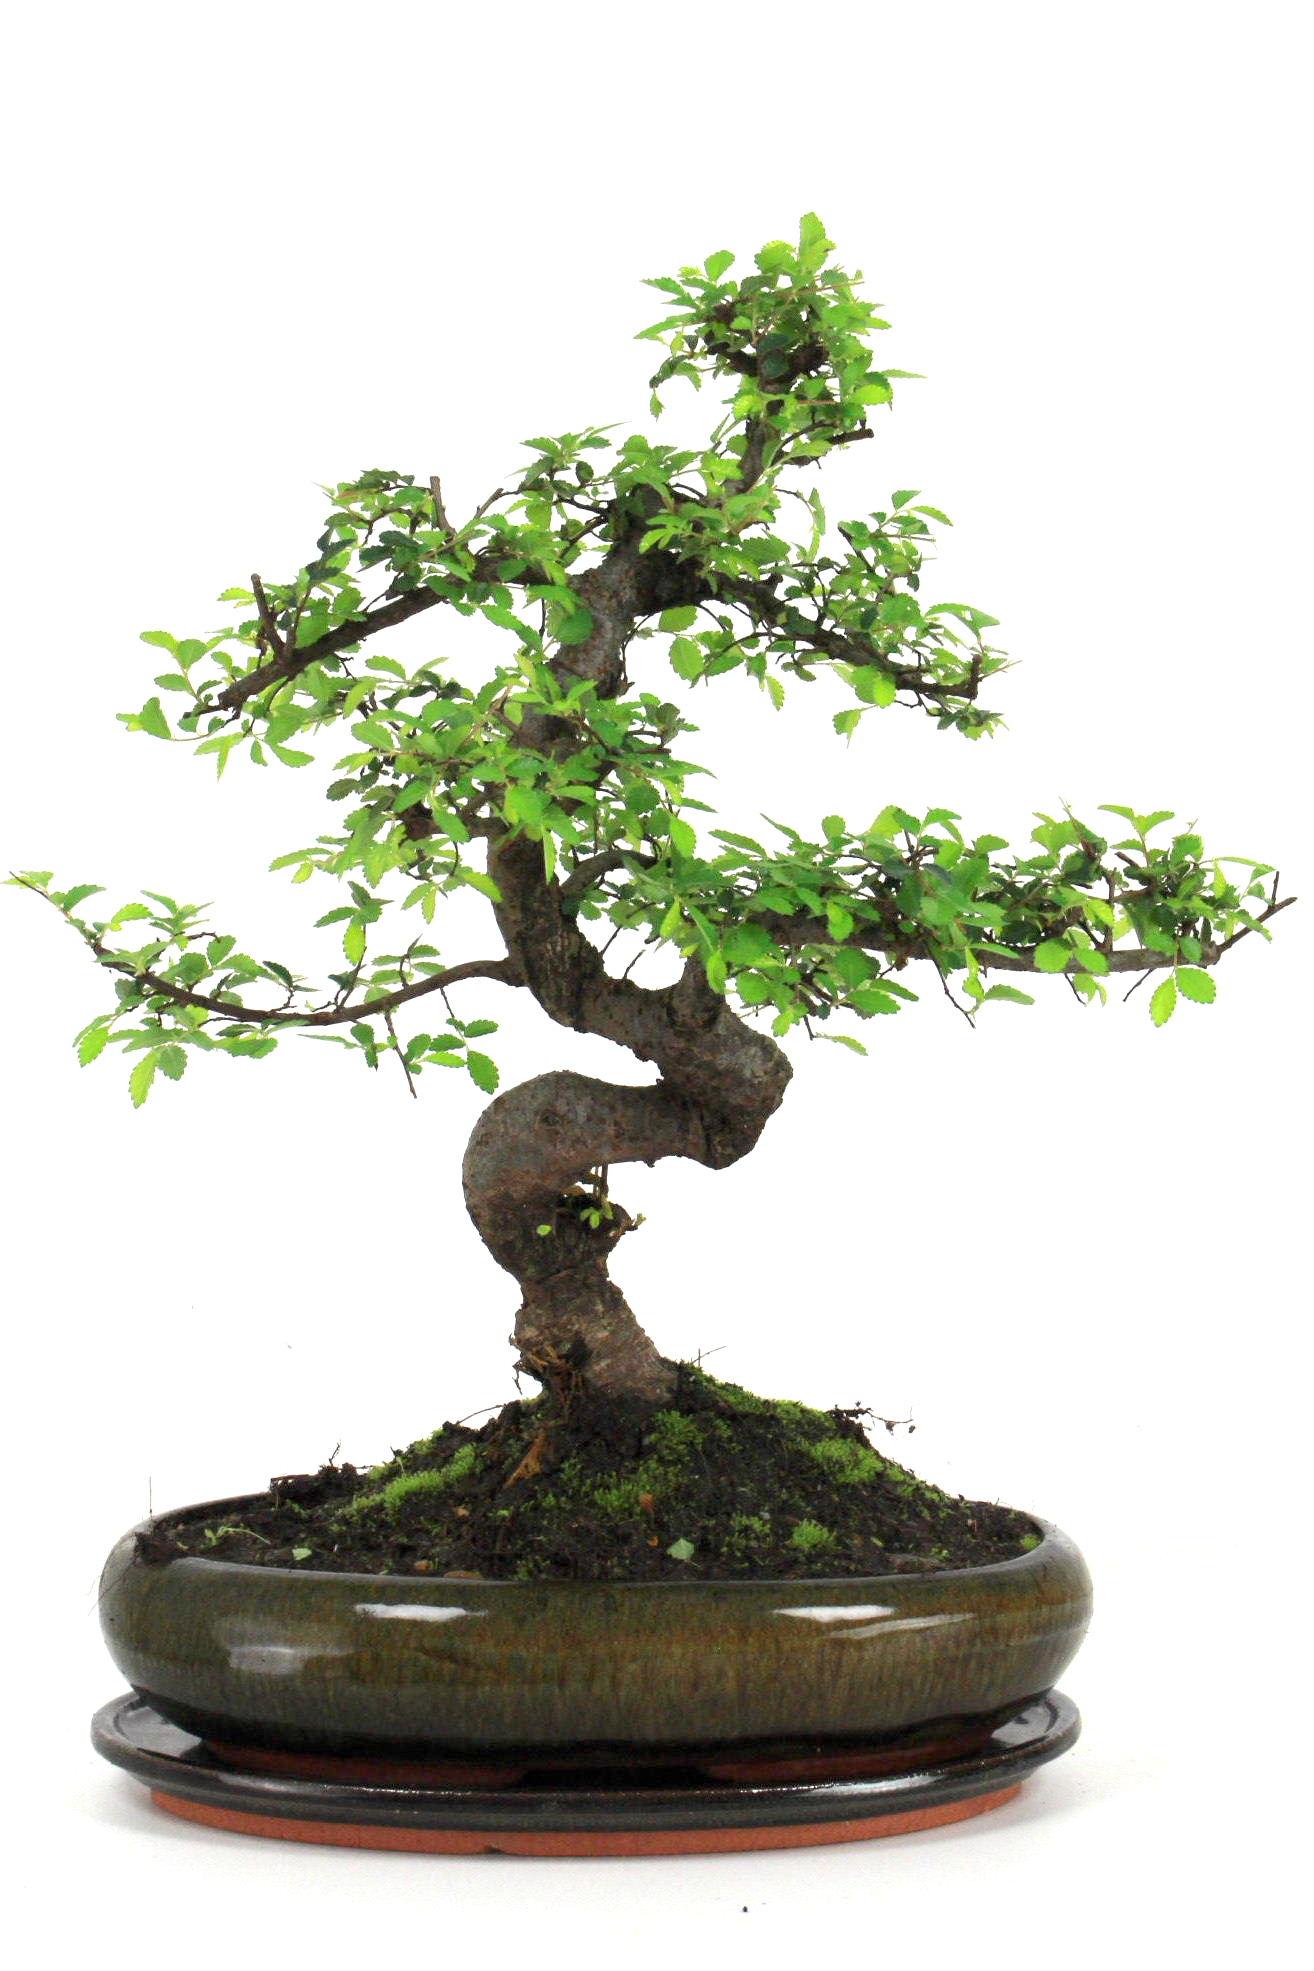 bonsai chinesische ulme 30 35 cm g1613 bei oyaki bonsai kaufen. Black Bedroom Furniture Sets. Home Design Ideas